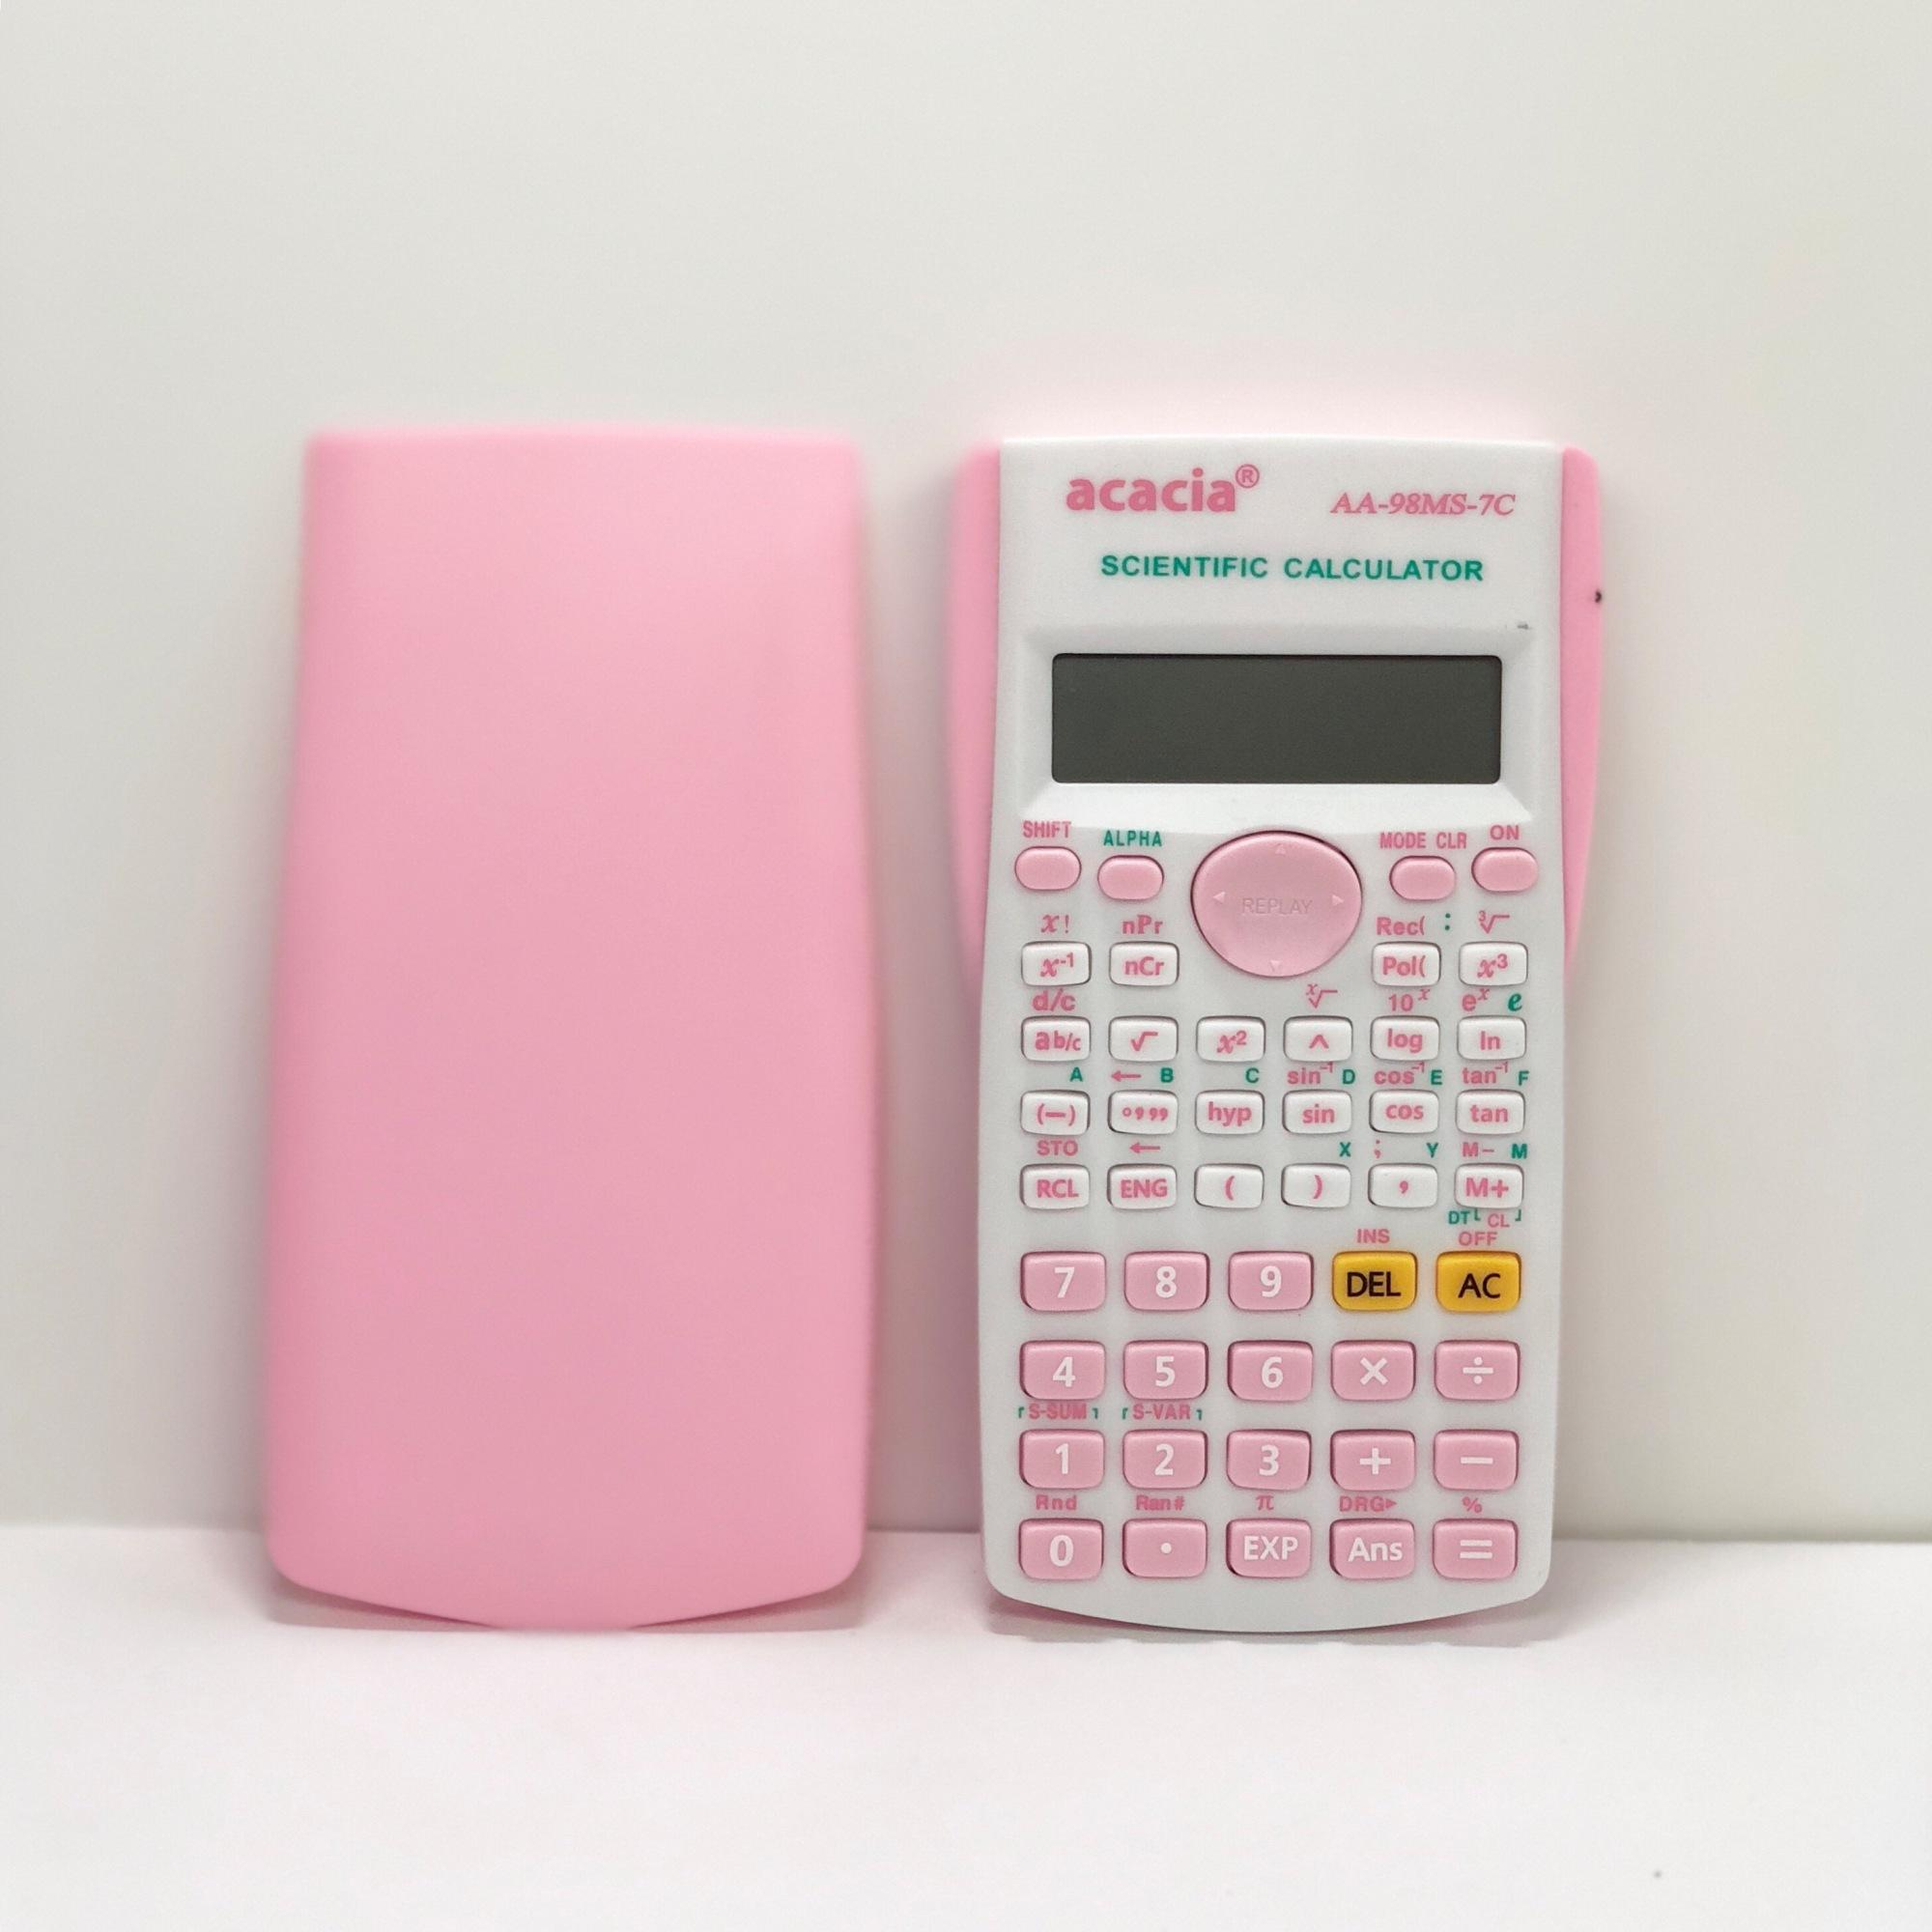 Calculator For Sale Calculators Prices Brands Review In Kalkulator Casio Portable Printer Hr 8 Tm Philippines